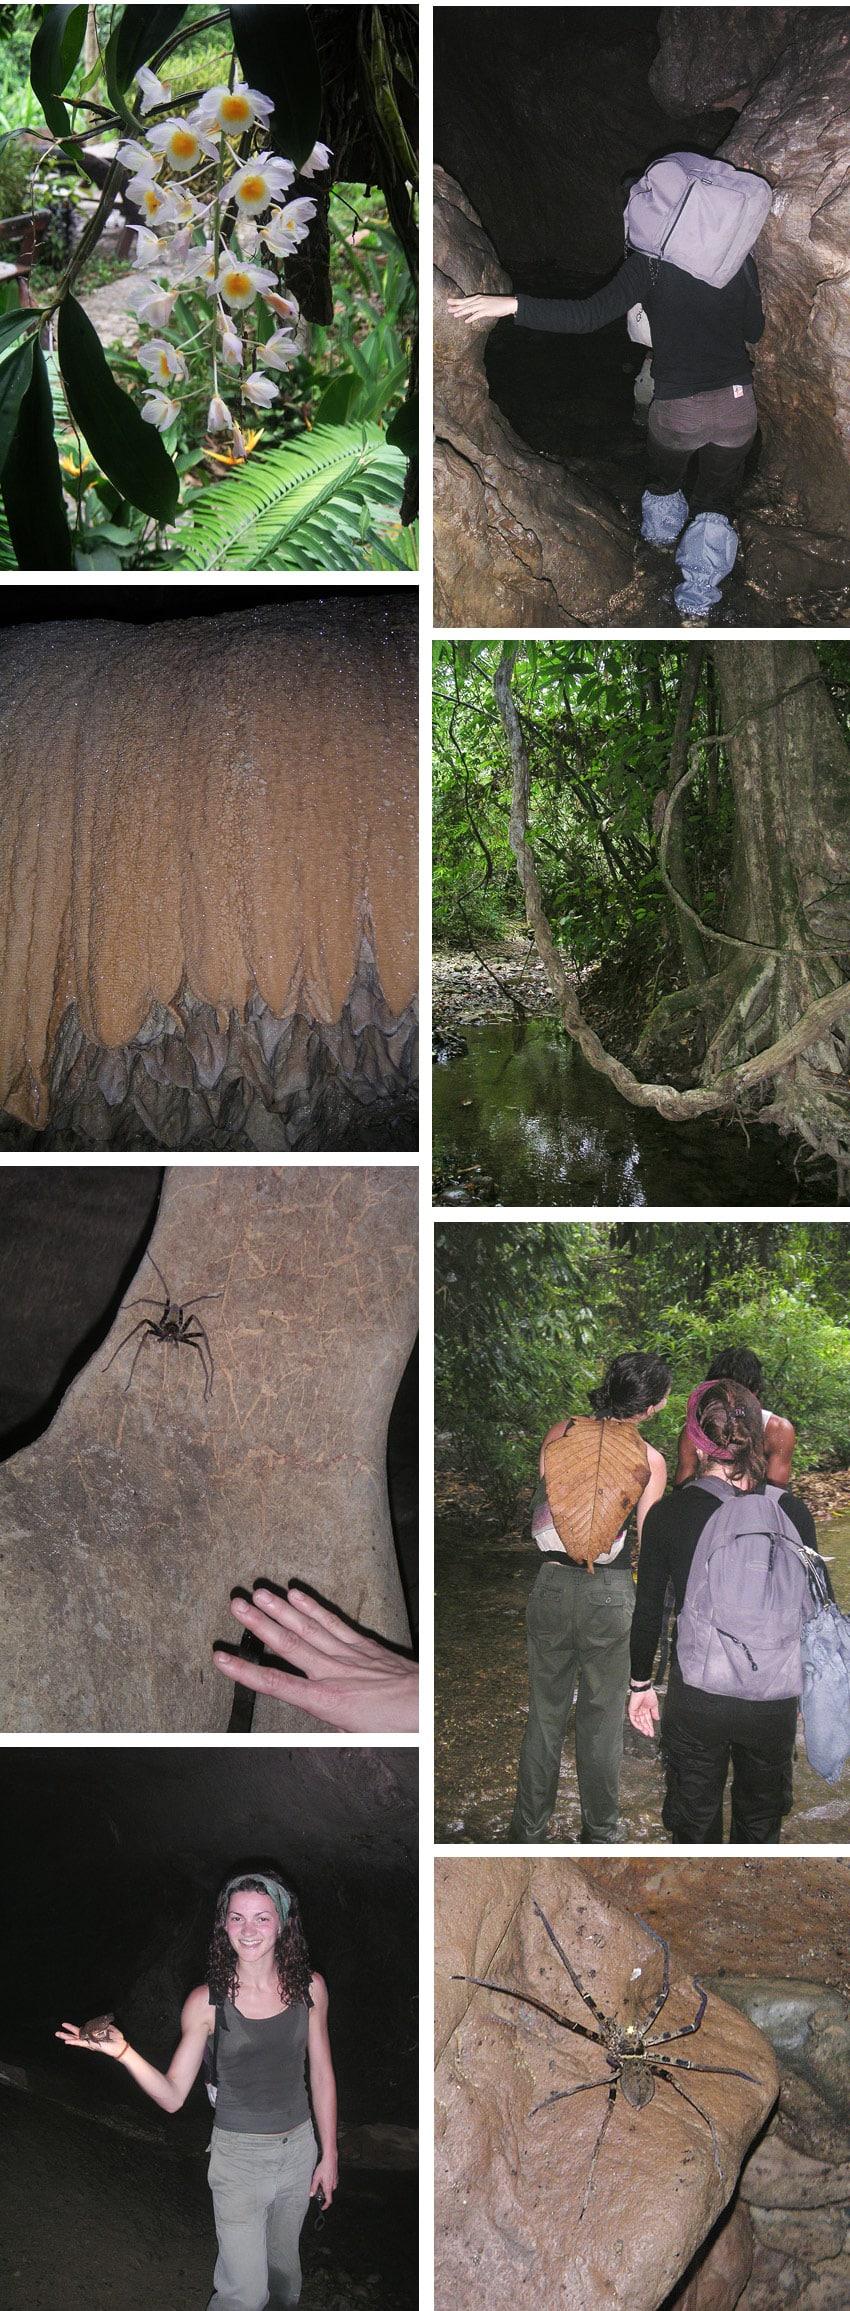 trekking dans la jungle de thailande-khao sok grotte thailande